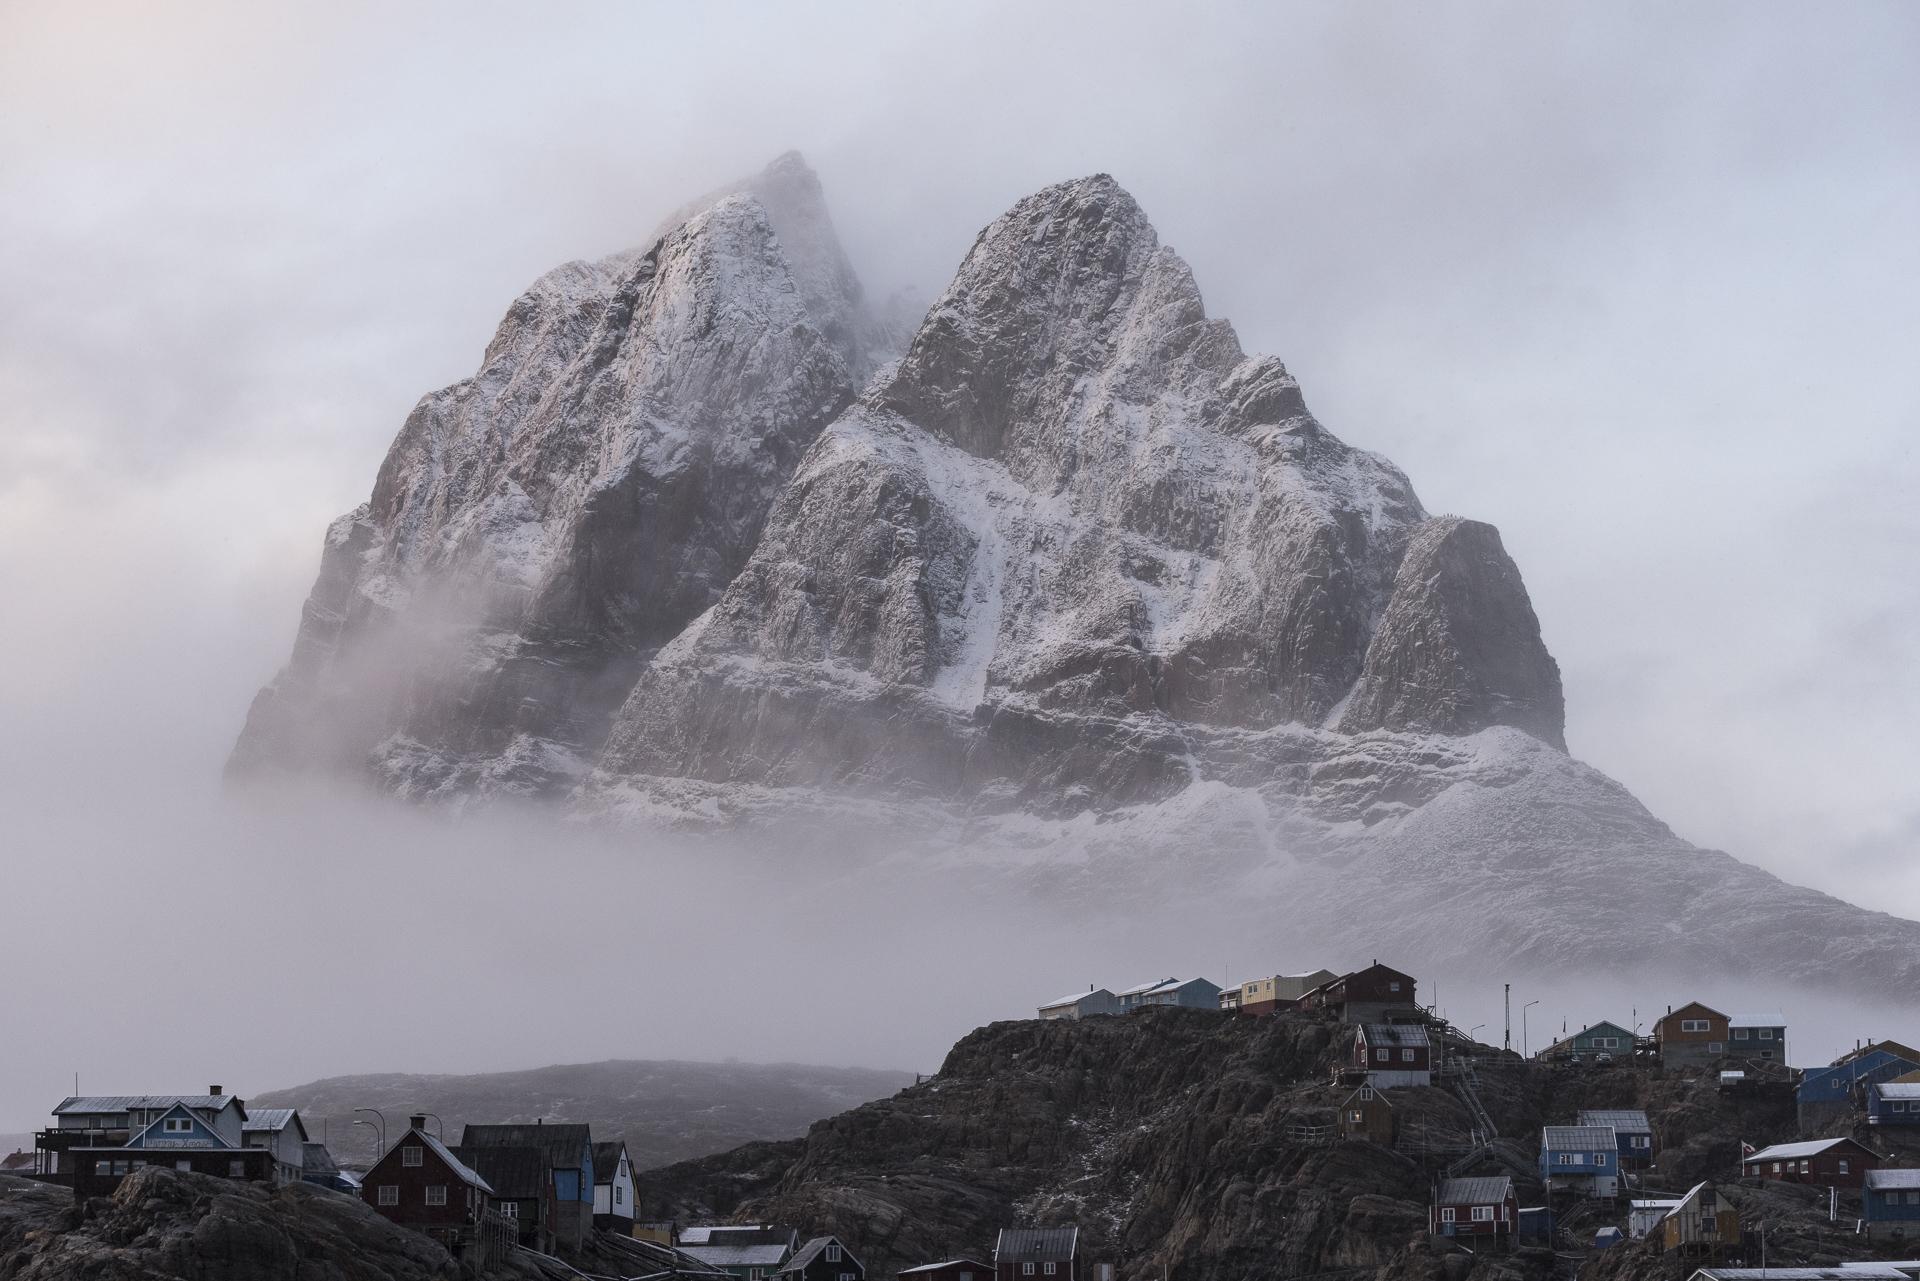 Defibaugh_Greenland_Uummannaq_a_108.jpg